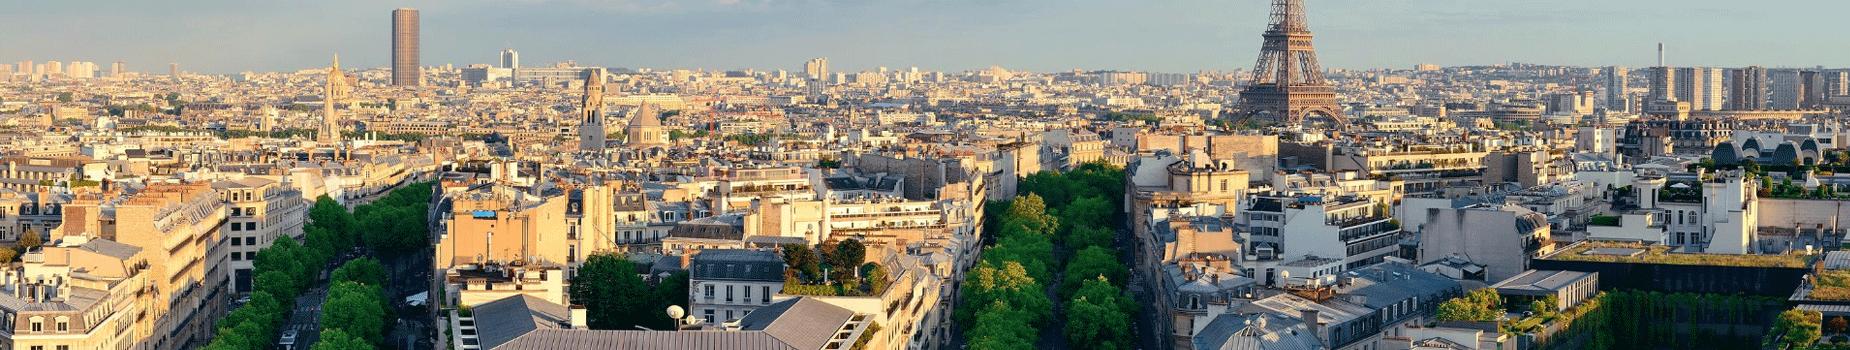 Ouderenreis Frankrijk